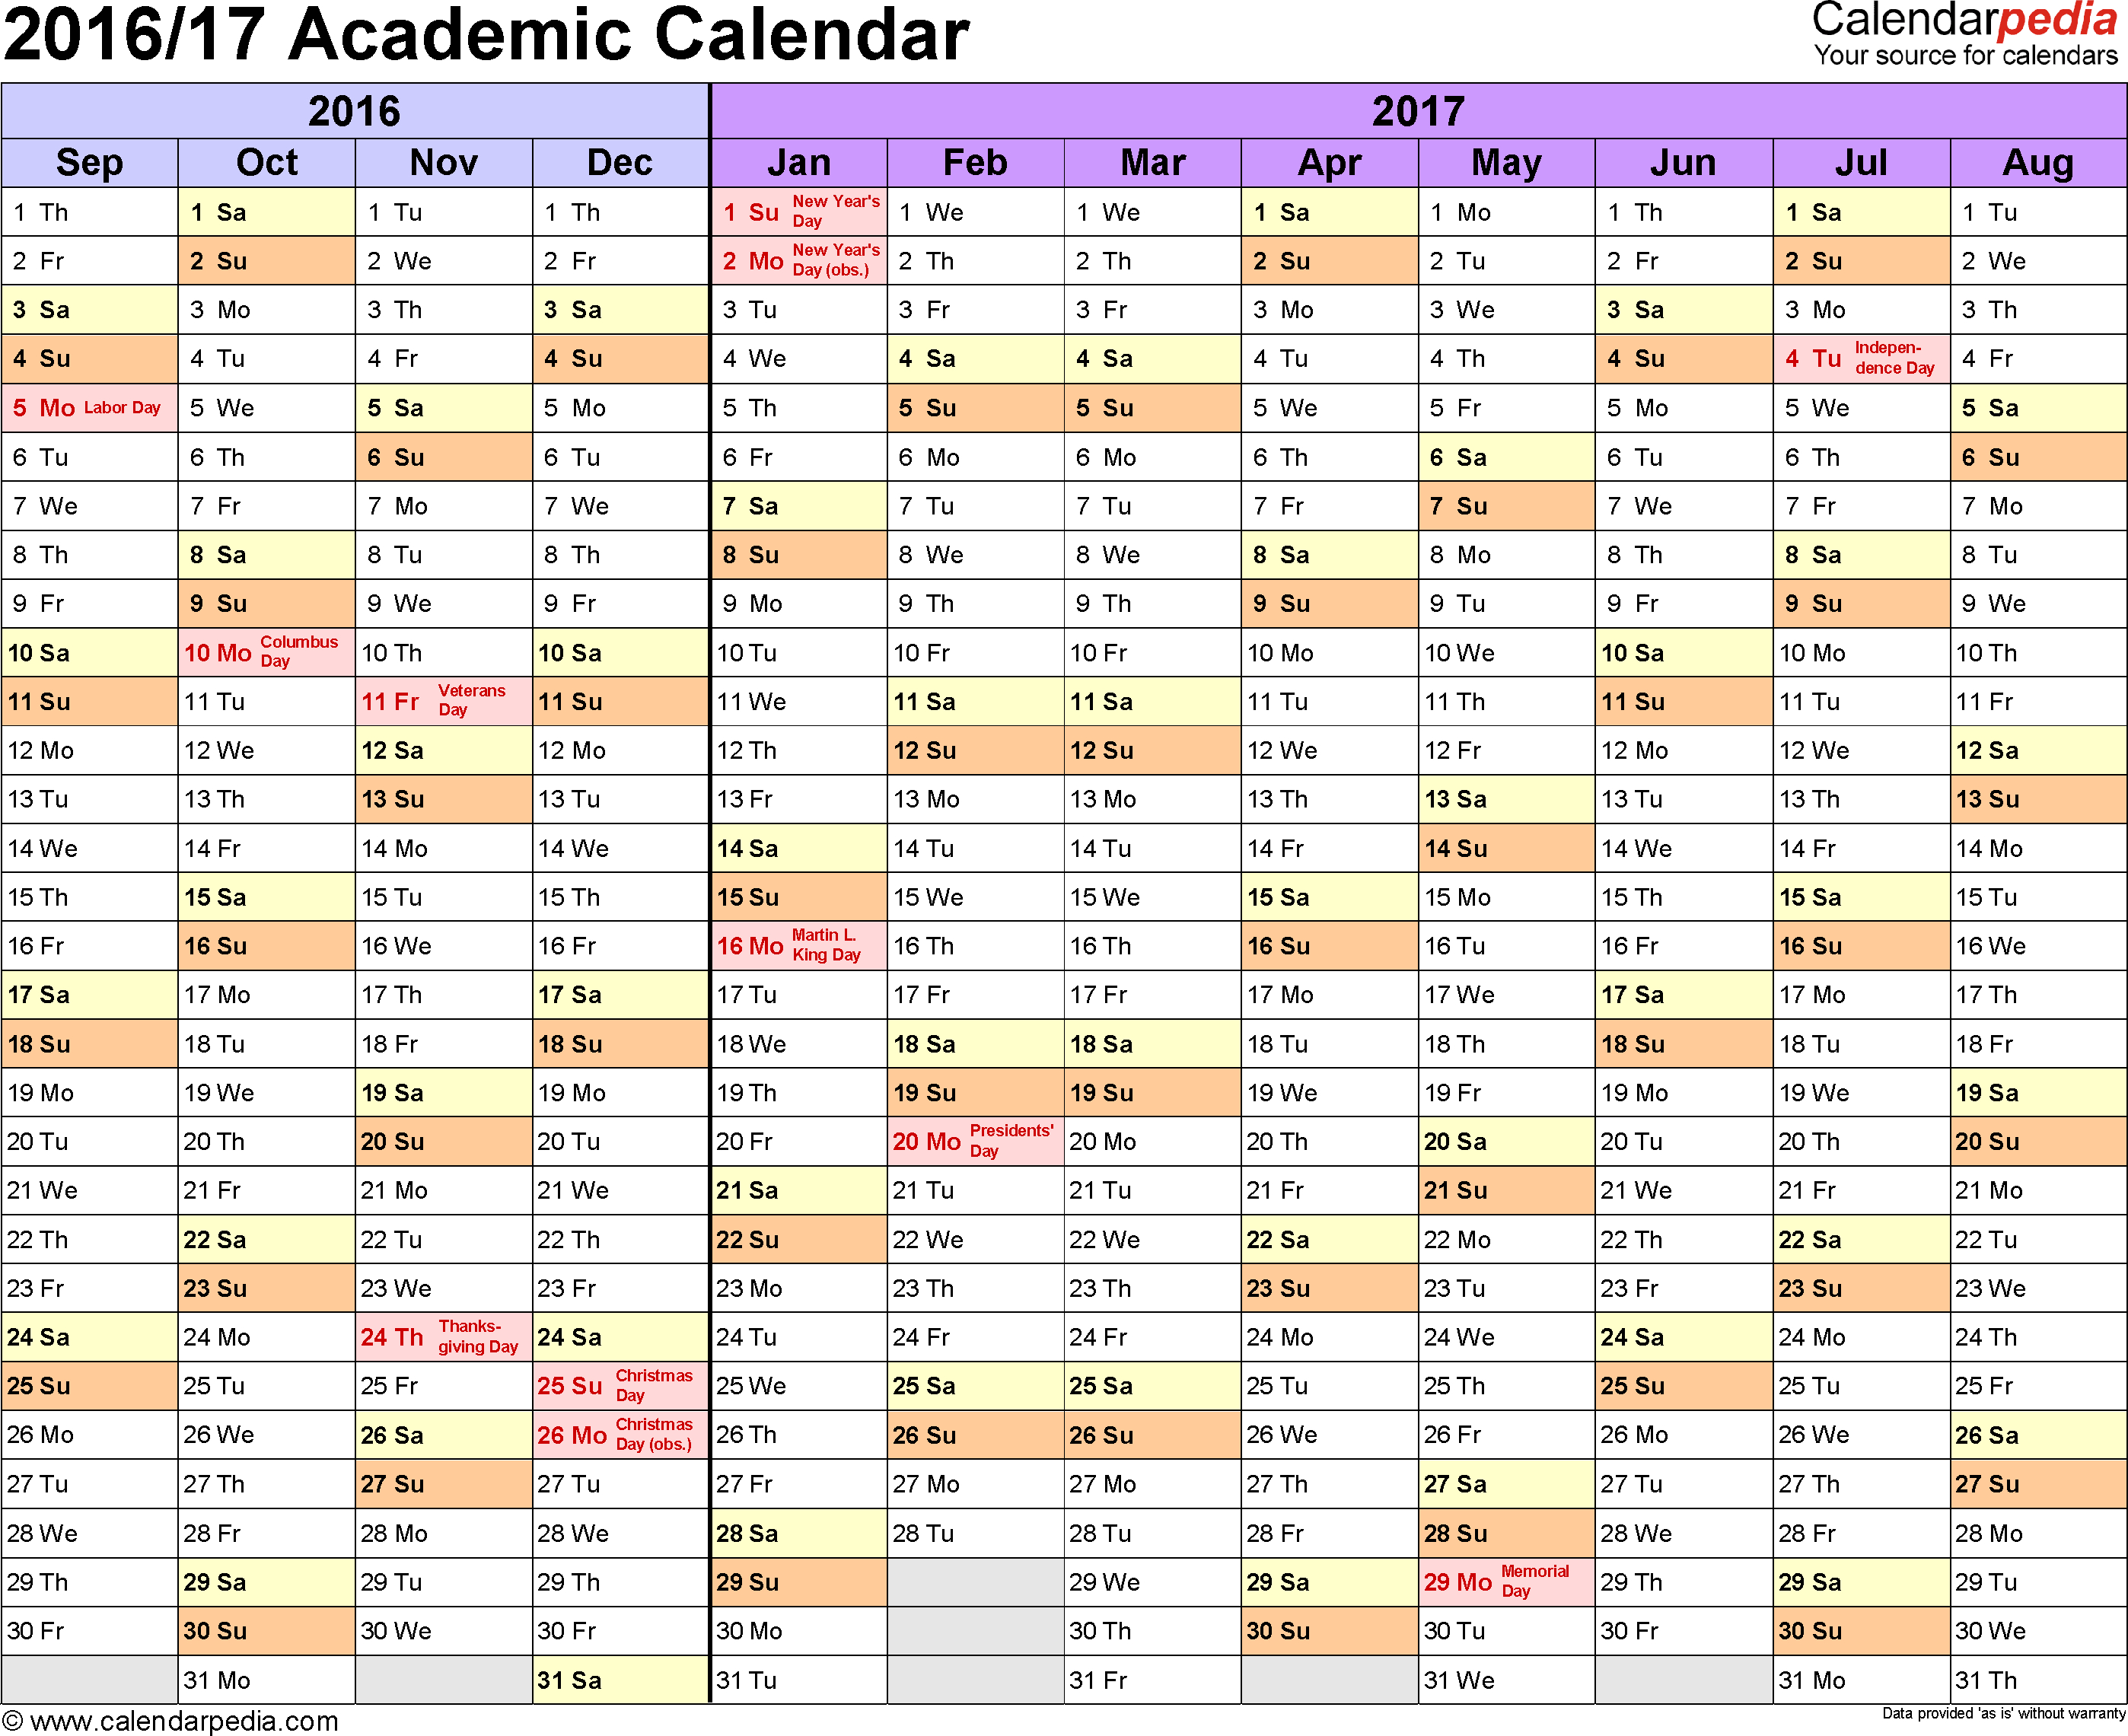 Academic Calendars 2016/2017 - Free Printable Word Templates in Academic Calendar Template